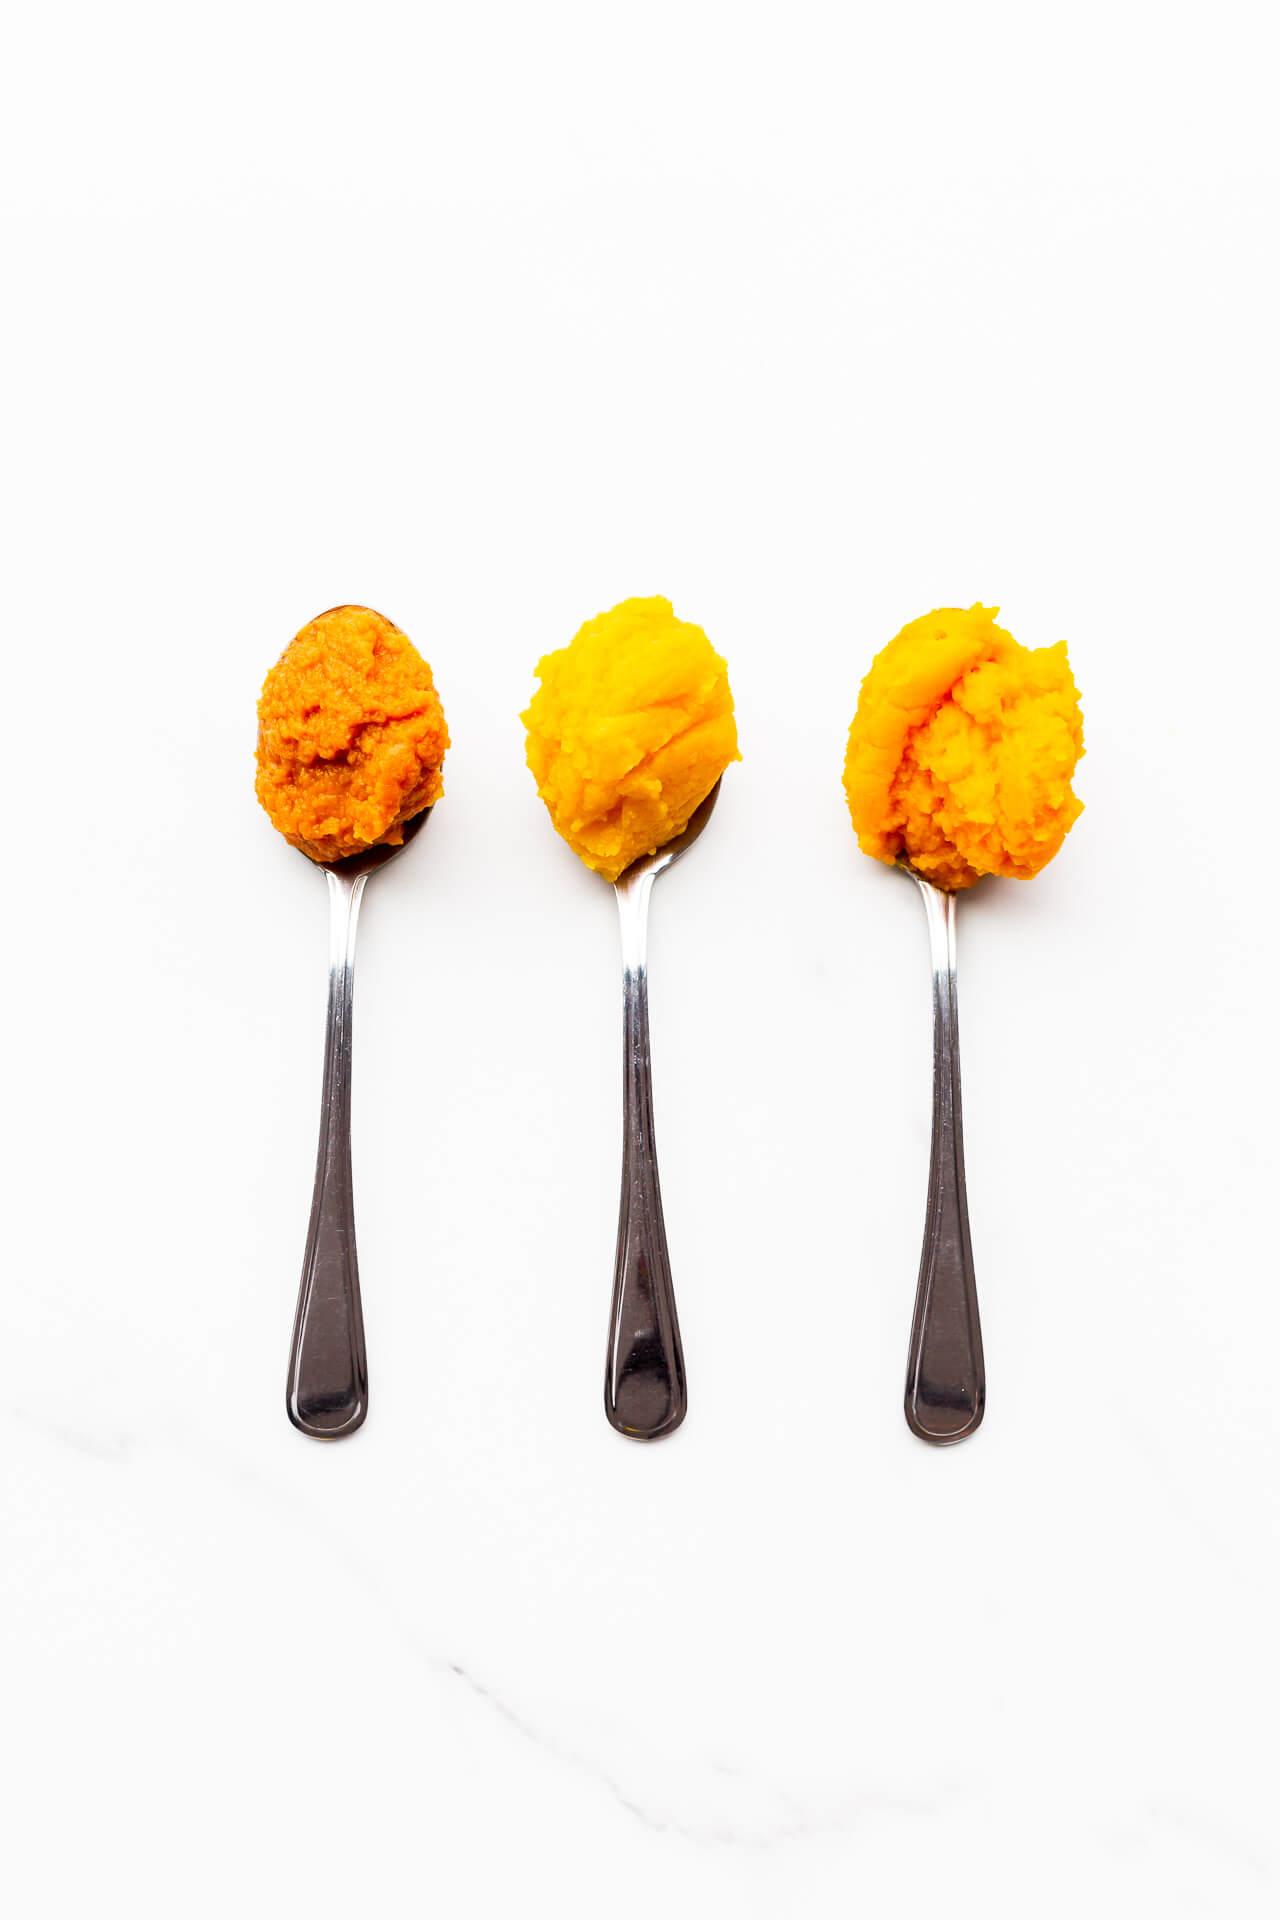 Spoon of canned pumpkin (dark orange) versus homemade sugar pumpkin purée (yellow-orange) versus kabocha squash purée (bright orange)